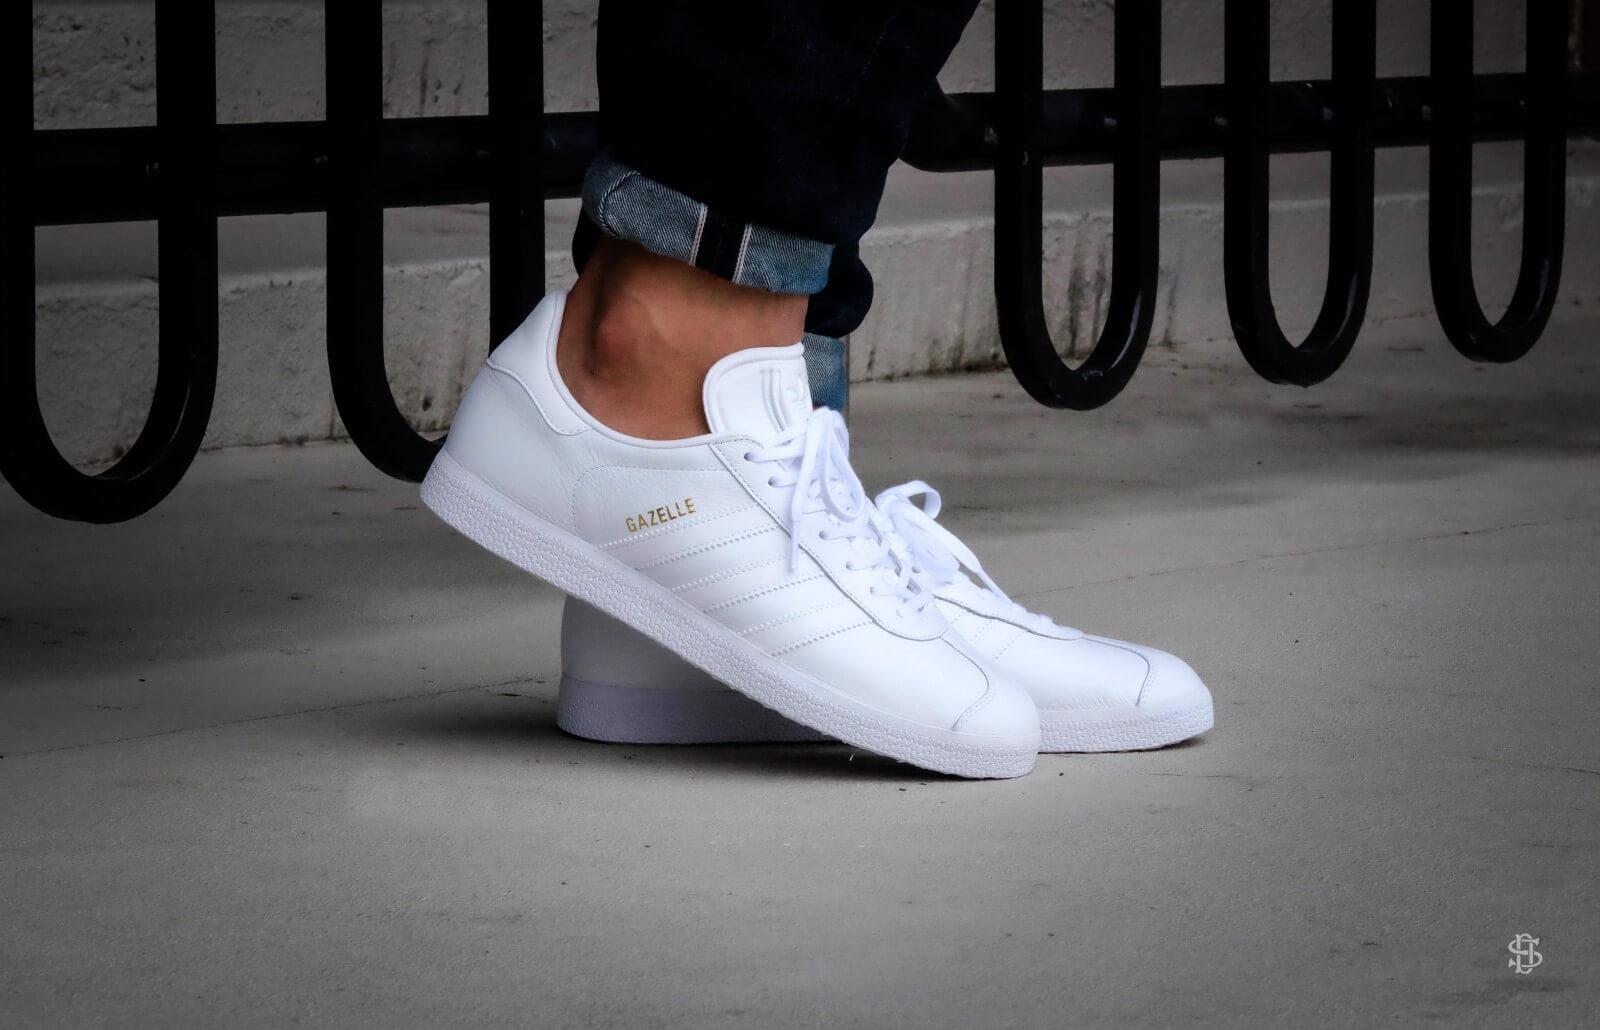 Adidas Gazelle Footwear White Gold Metallic BB5498